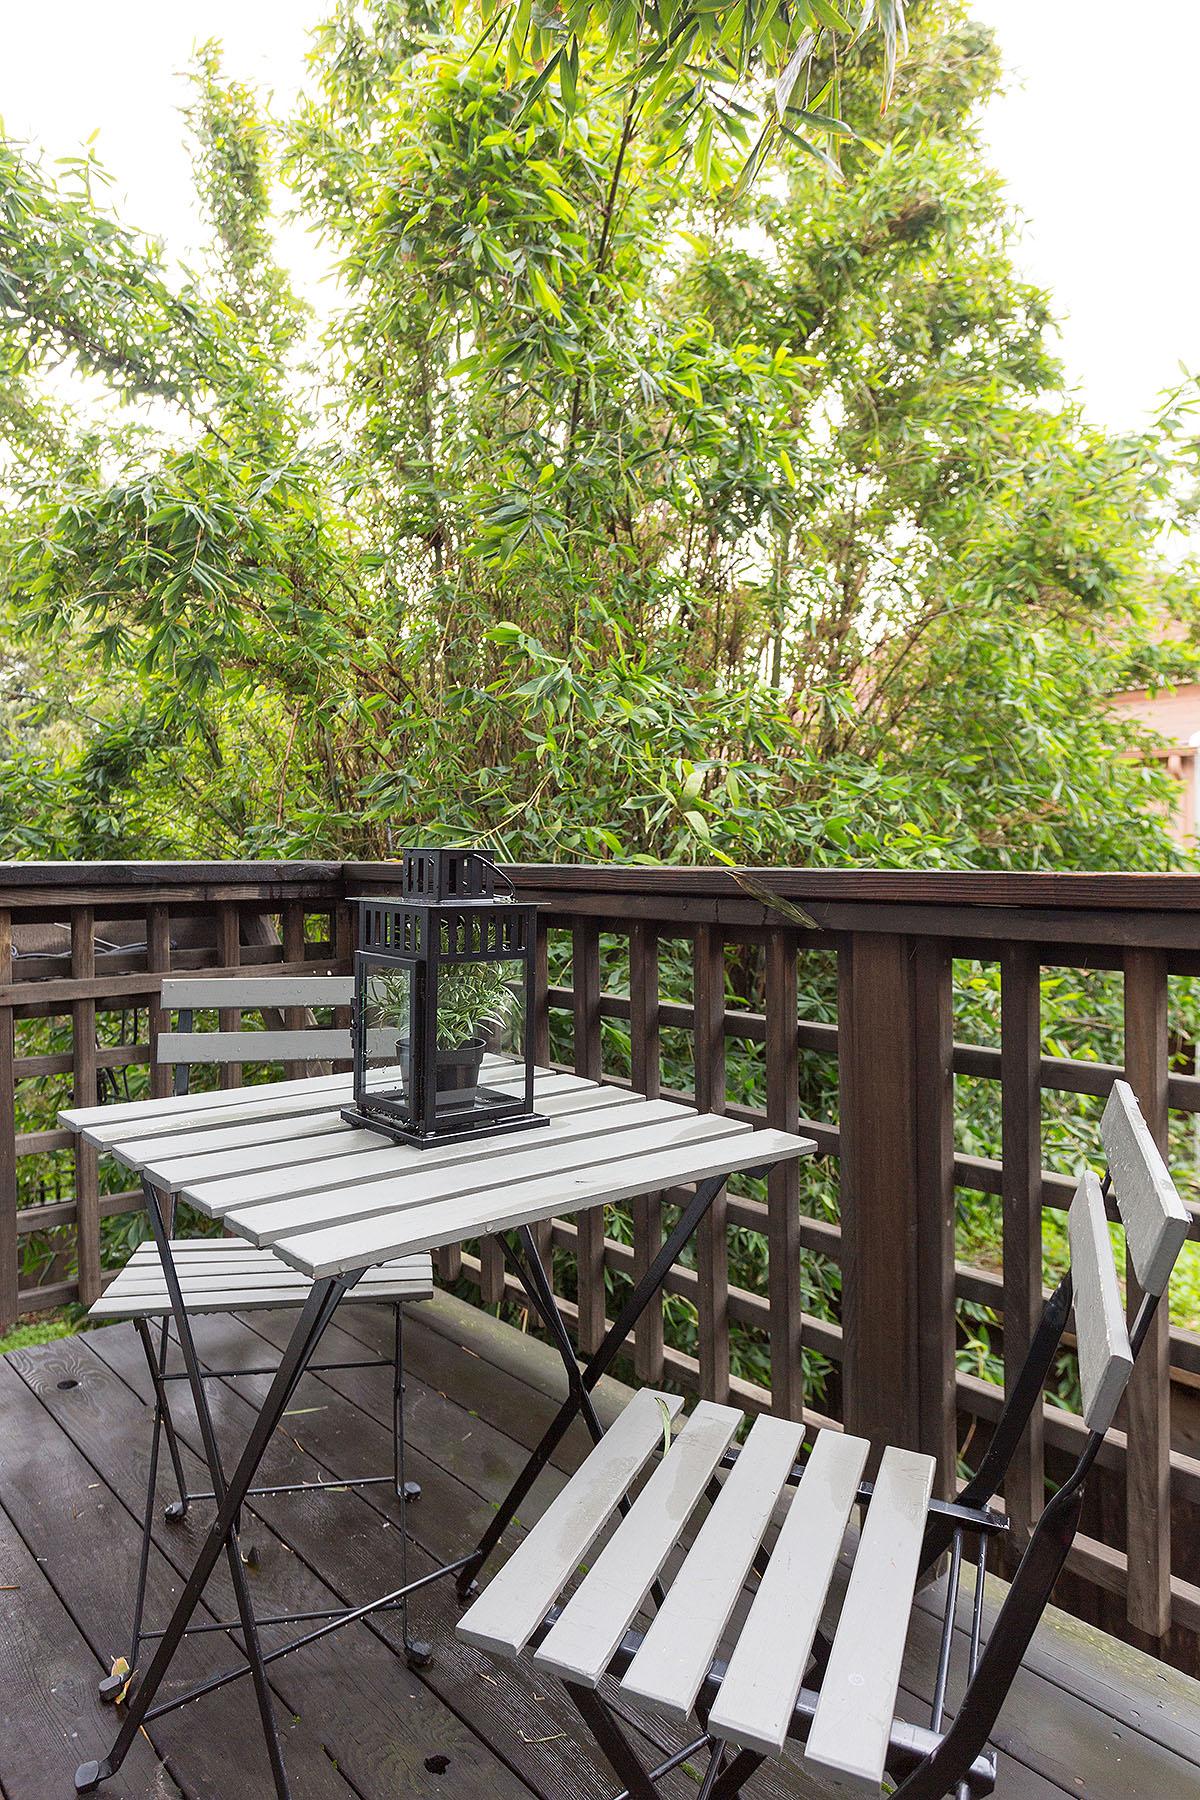 Breakfast Deck - A deck off the kitchen that overlooks the garden..